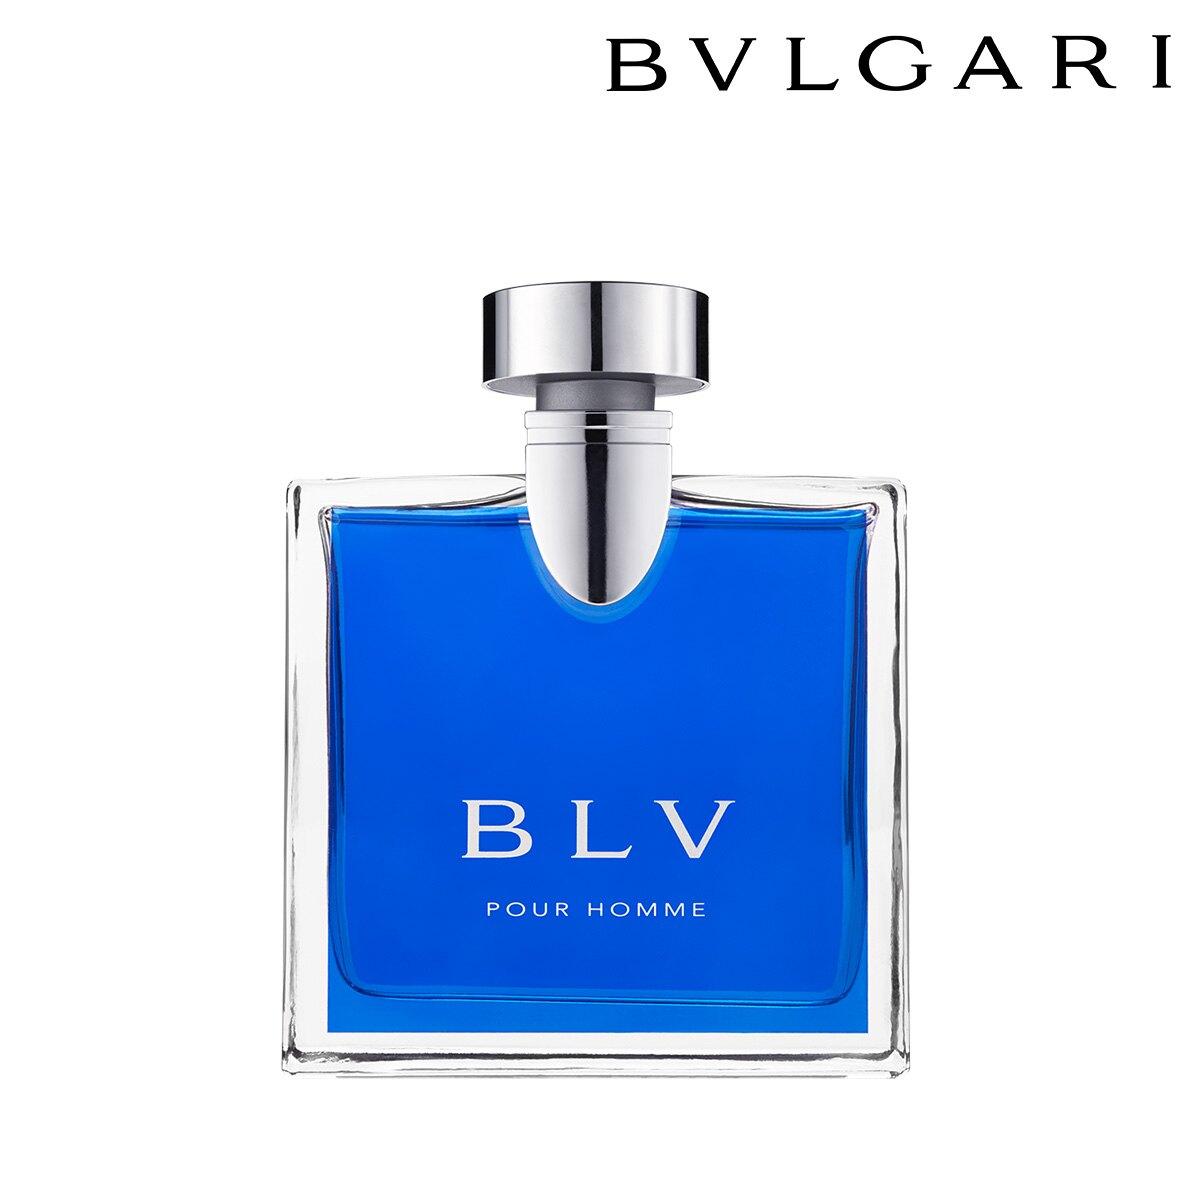 BVLGARI BLV 藍茶男性淡香水 100ML ★七彩美容百貨★